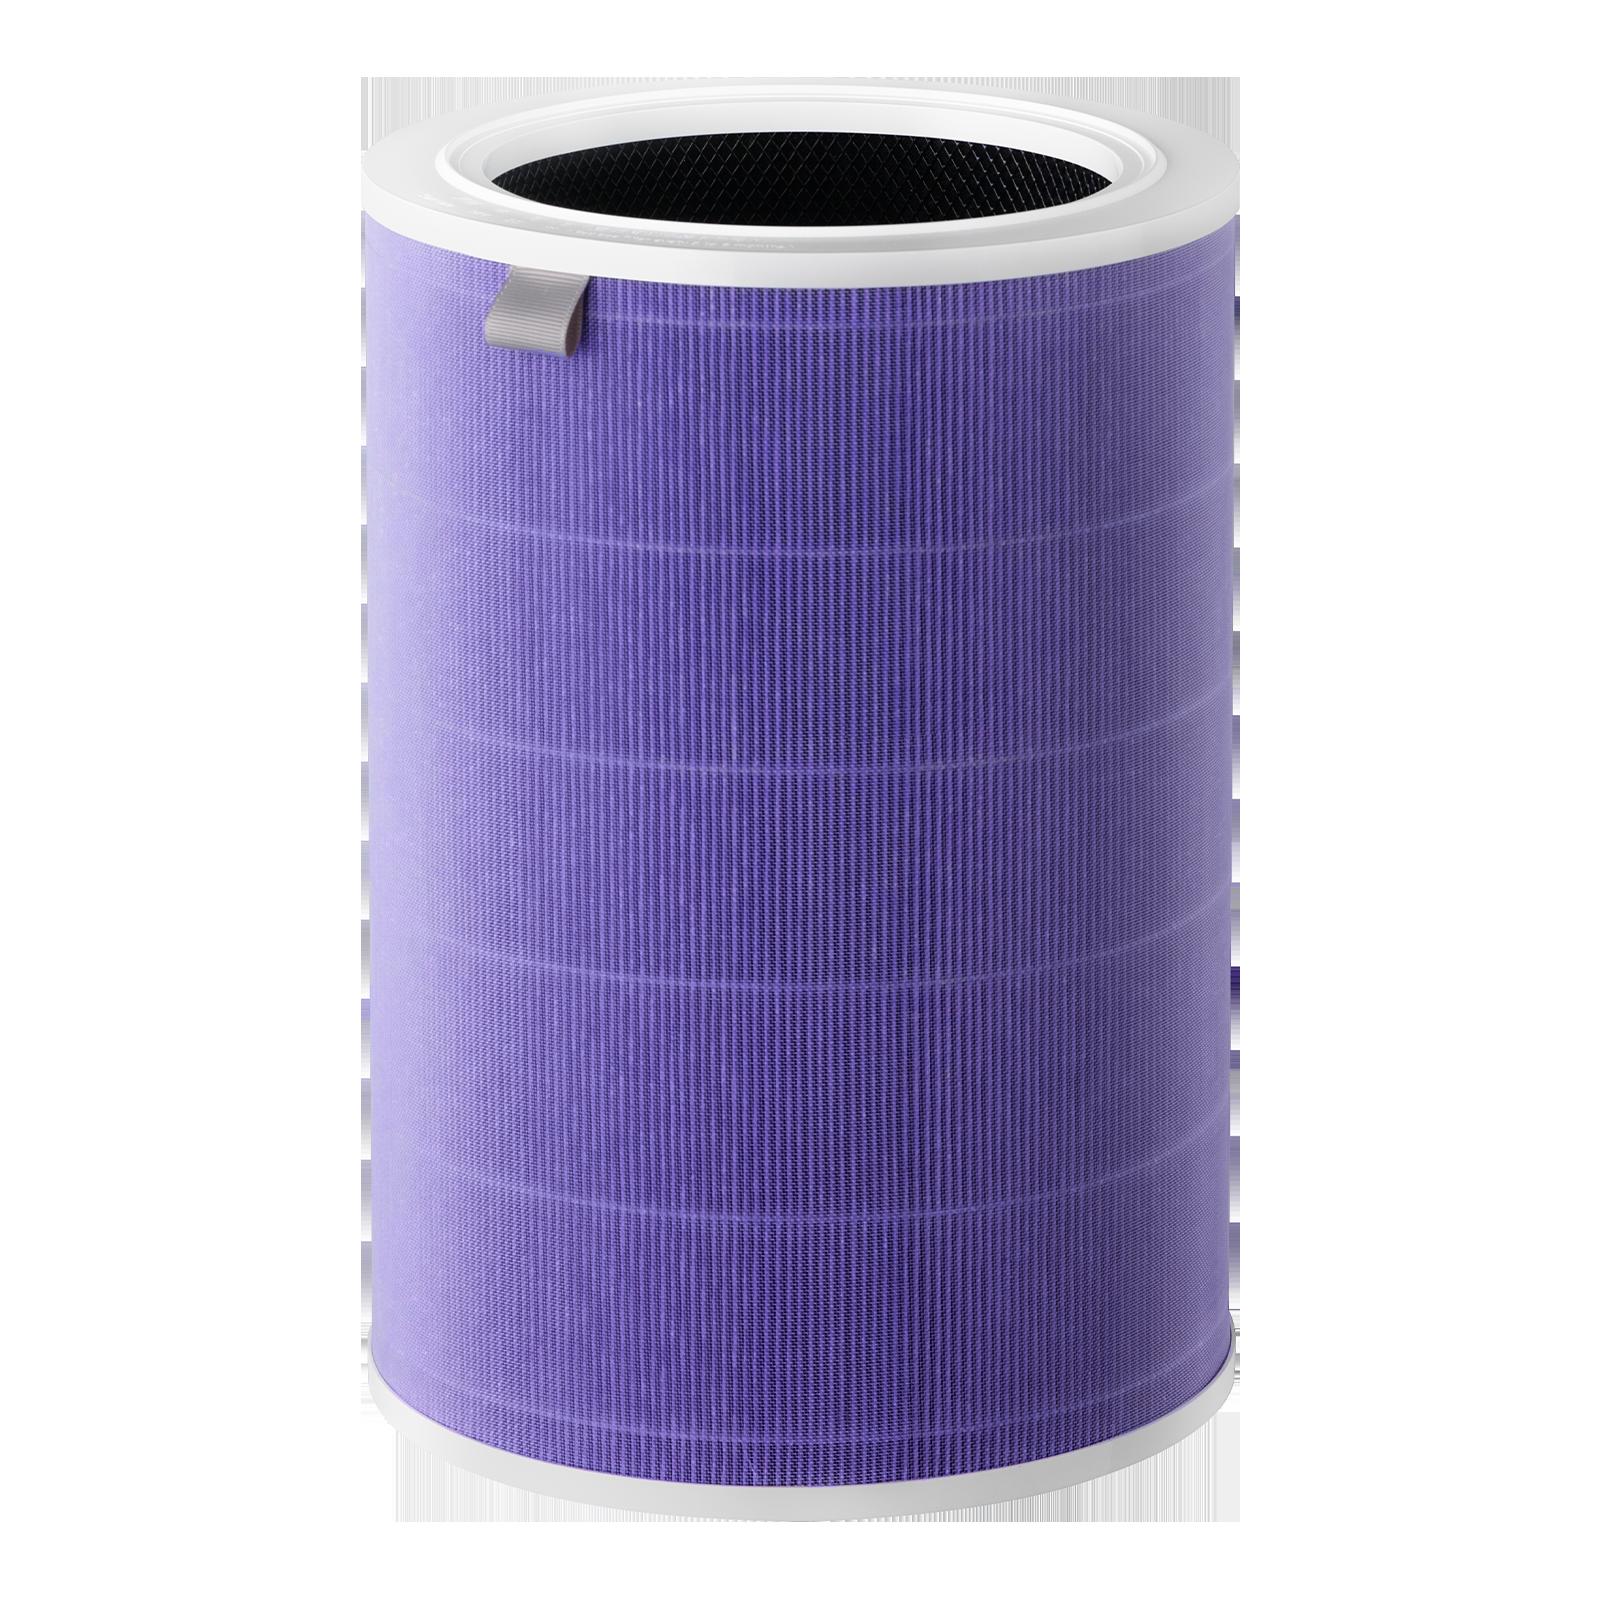 Mi Air Purifier Filter (Antibacterial) Фиолетовый